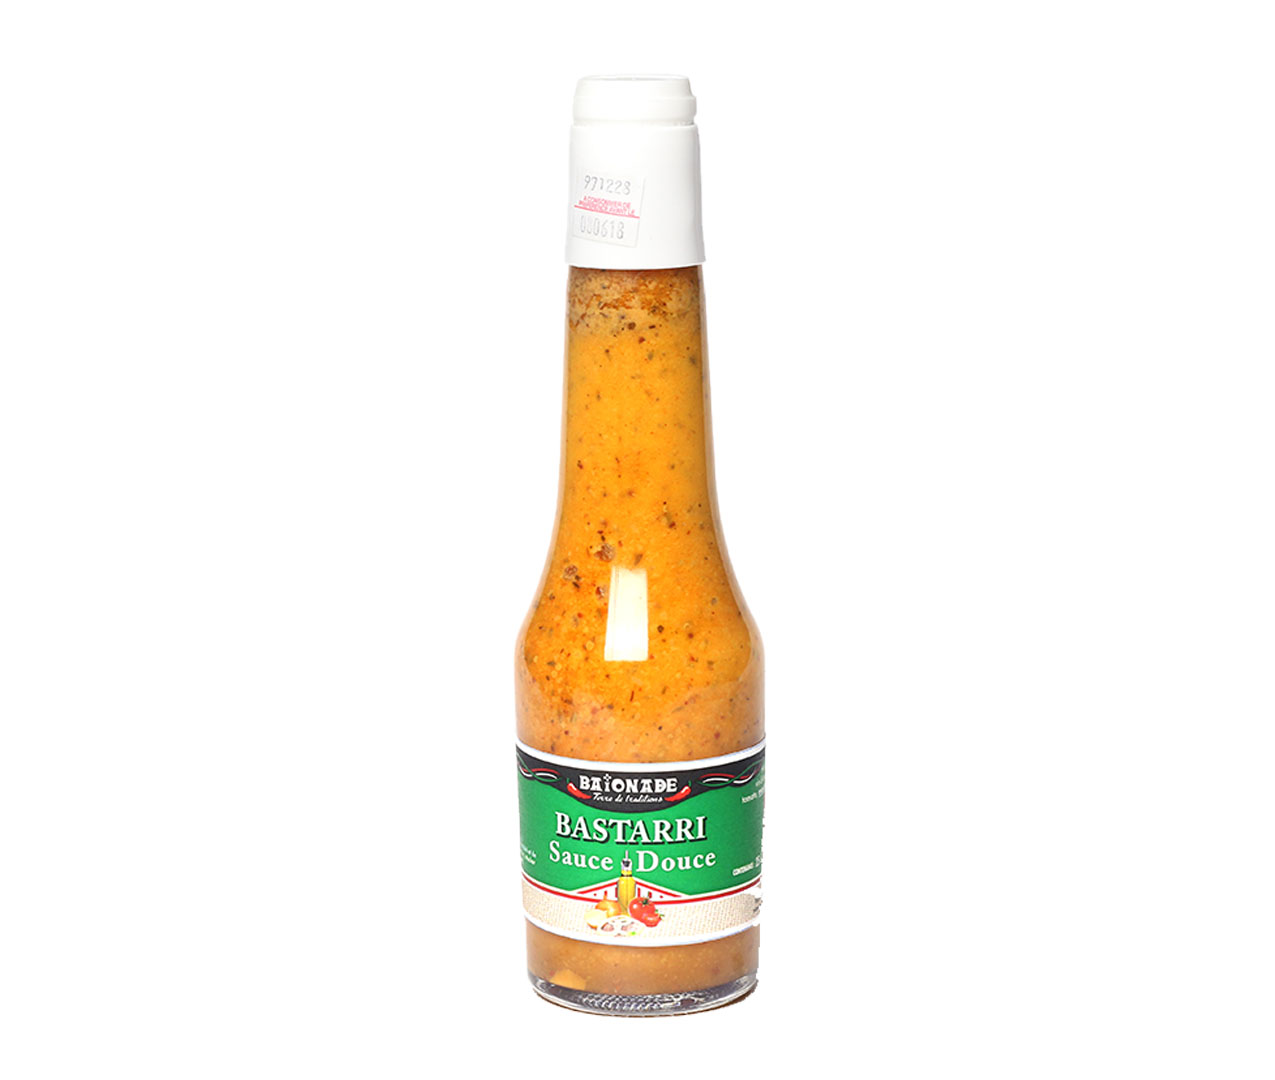 Sauce Bastarri douce Baïonade